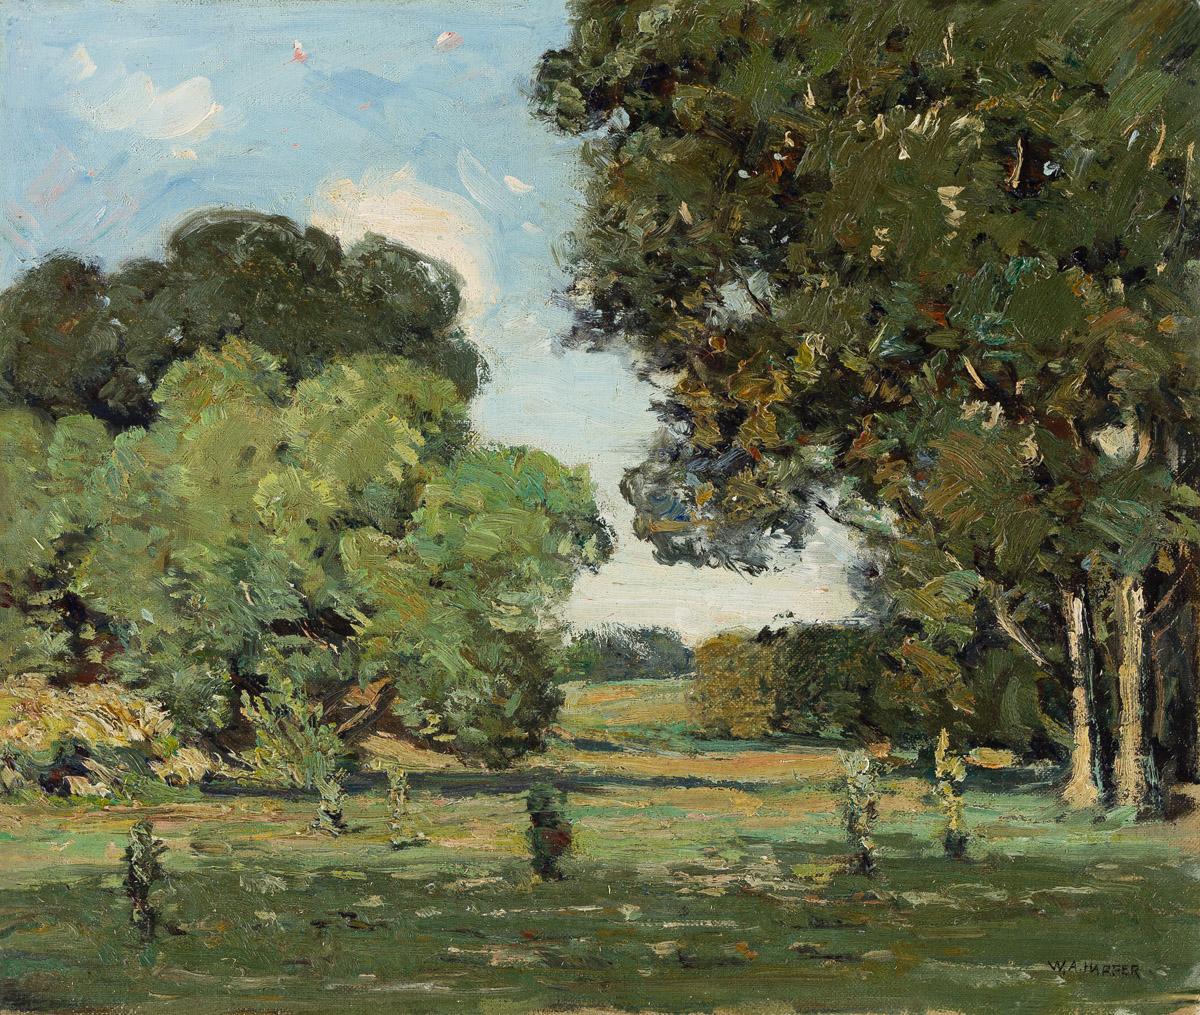 WILLIAM A. HARPER (1873 - 1910) Untitled (Landscape).